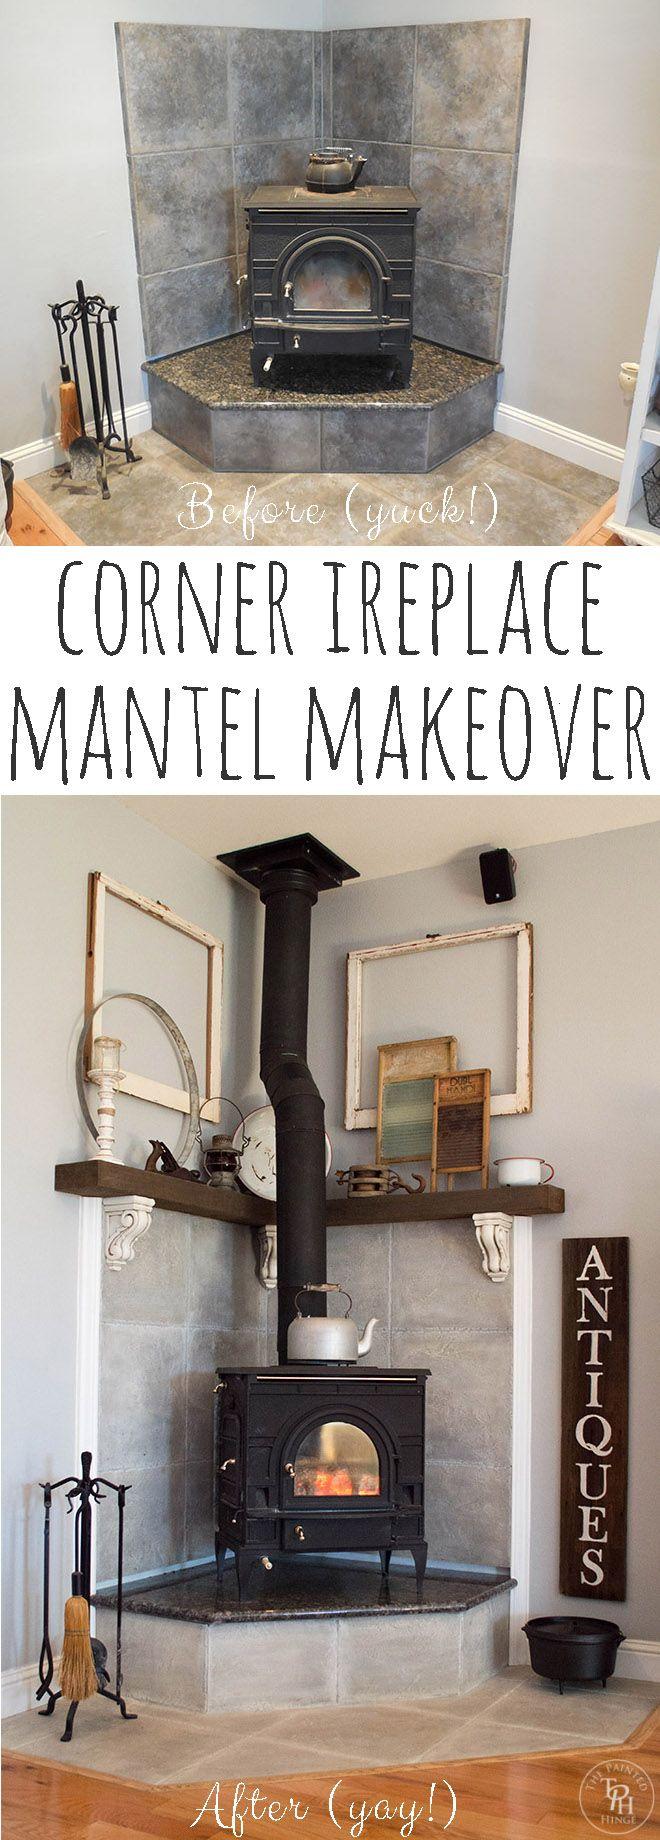 1000 Ideas About Corner Fireplace Mantels On Pinterest Corner Fireplaces Fireplace Mantels